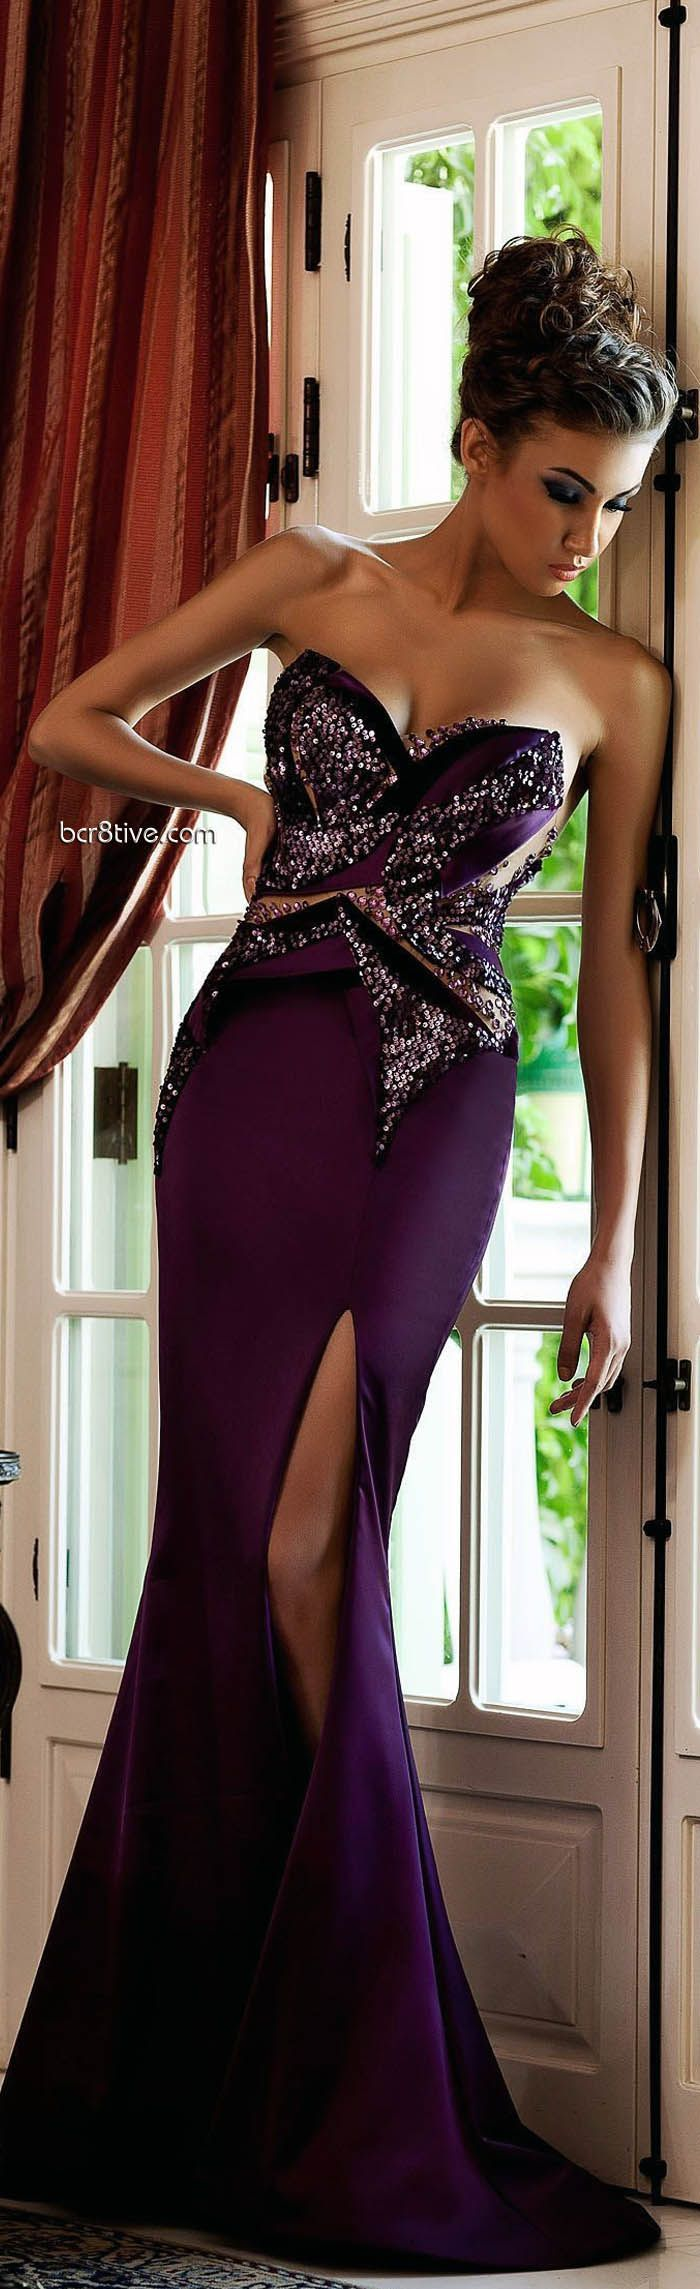 Fustana 2015 modele te fustanave 2015 dresses 2015 fustana modele te - Dresses